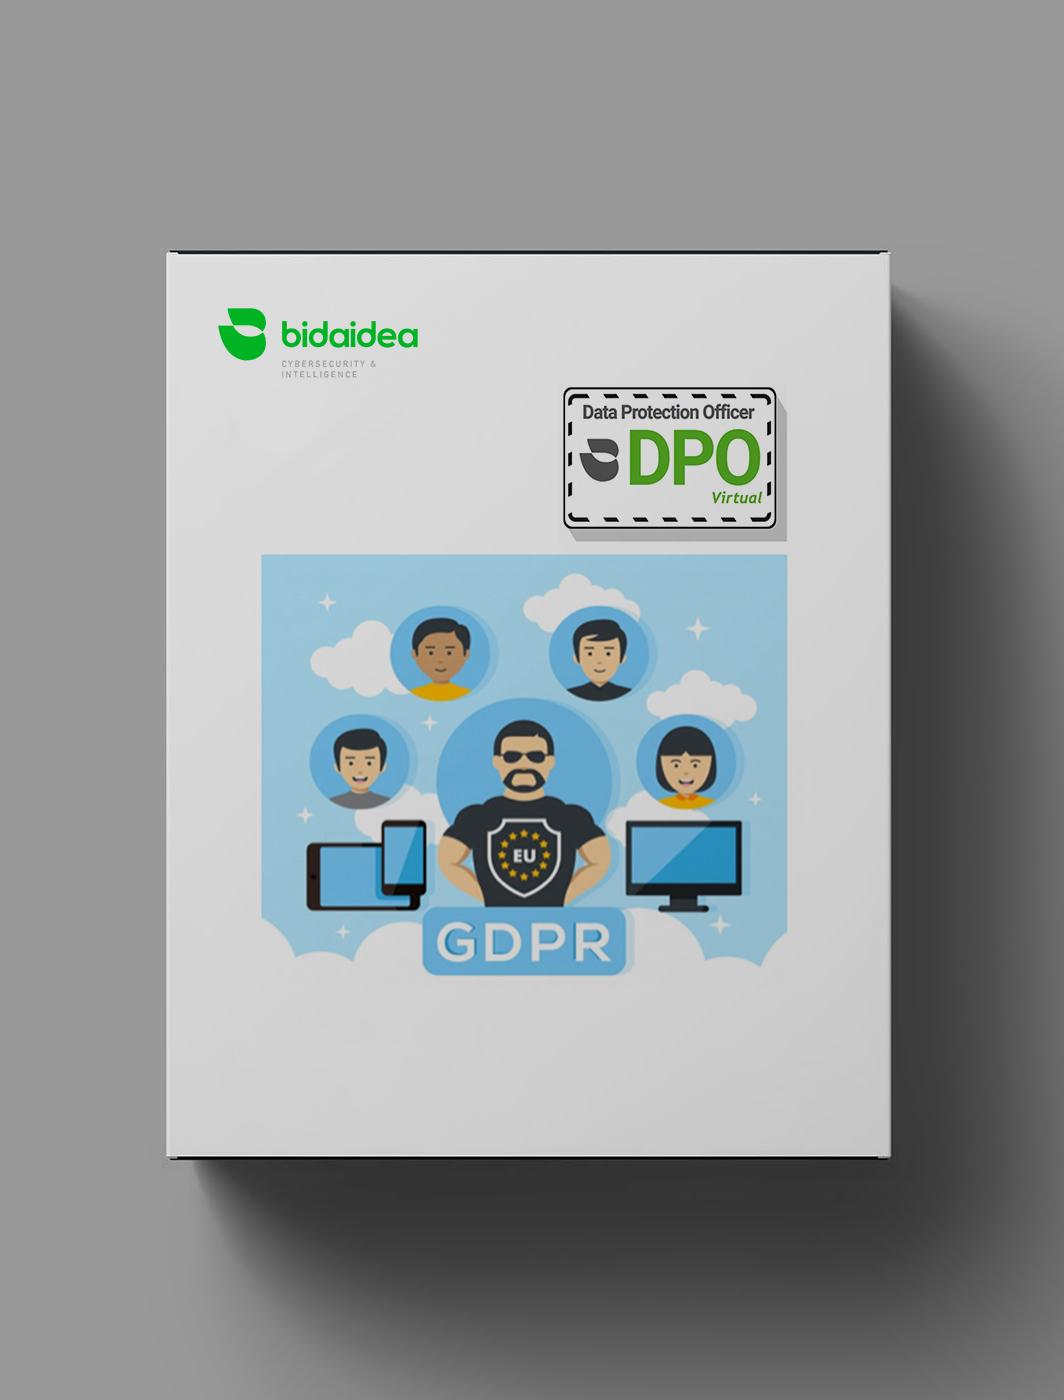 cyberpacks bidaidea dpo - Empresa de Ciberseguridad